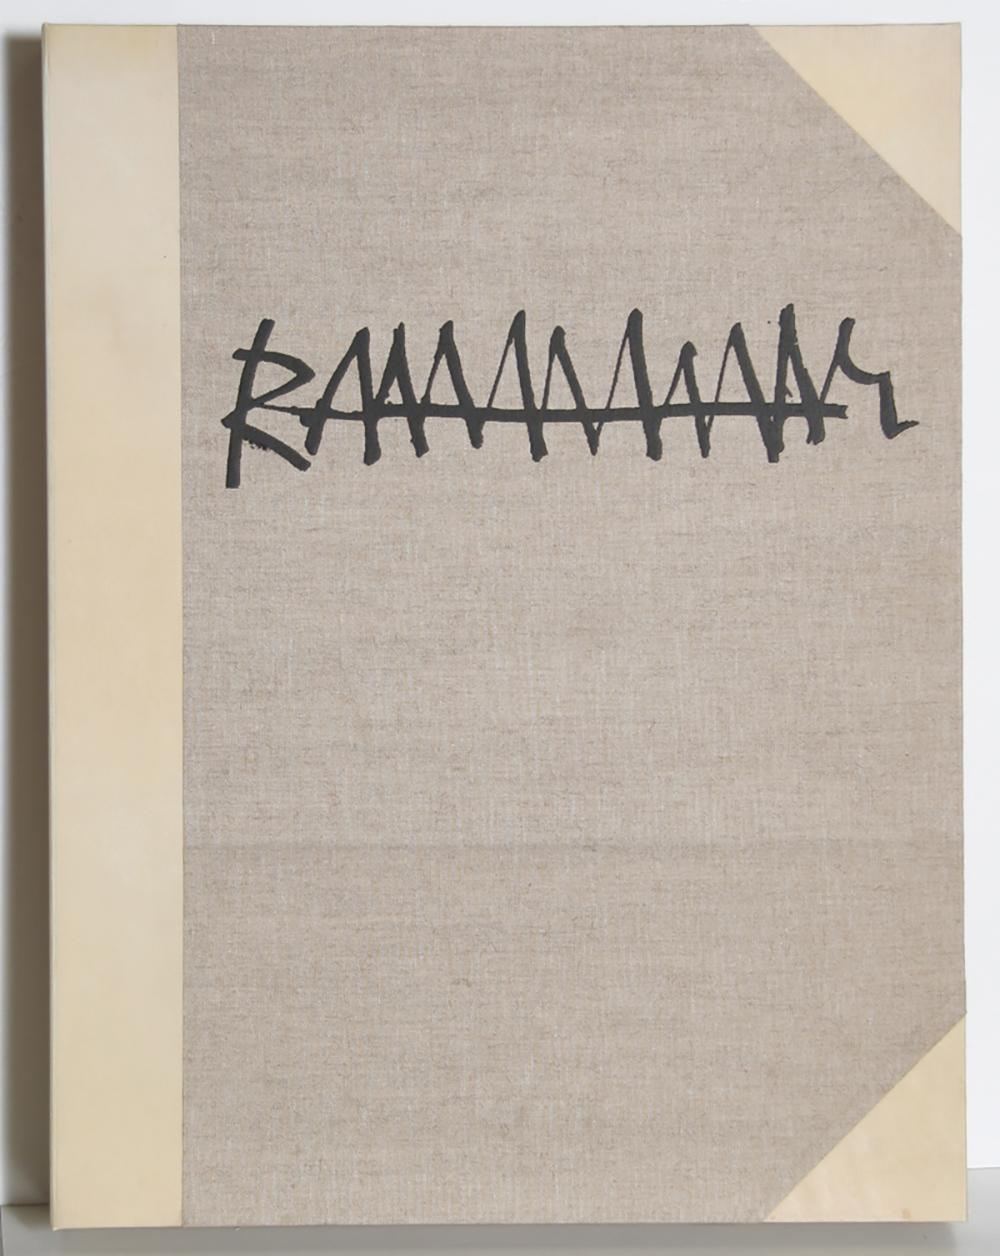 Abraham Rattner, In The Beginning, Portfolio of 12 Lithographs